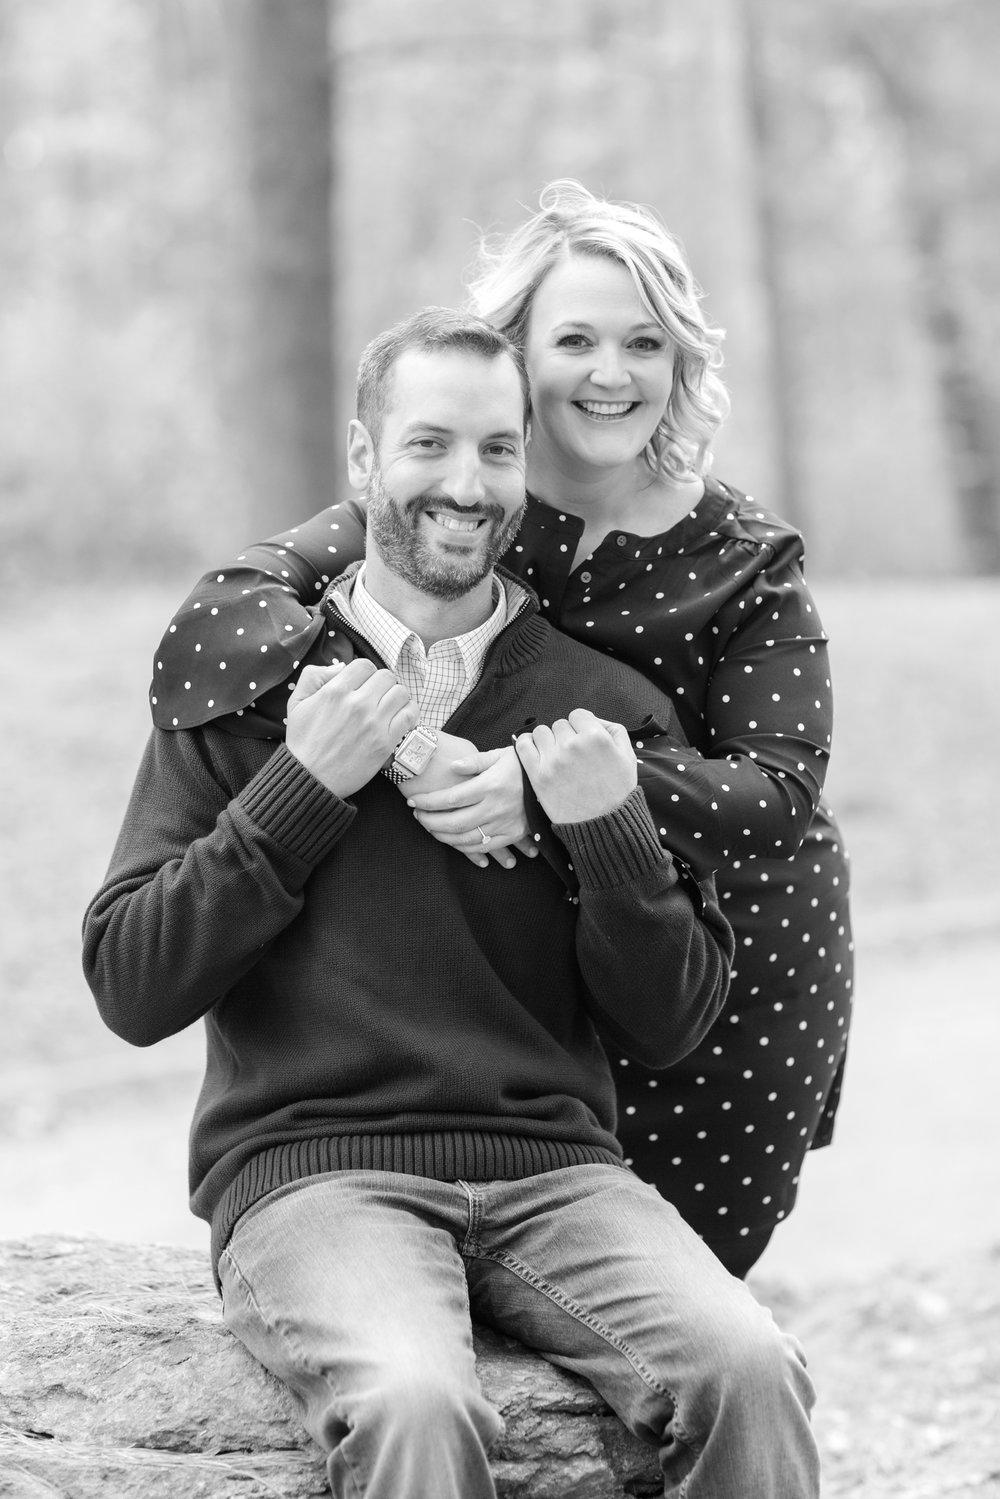 Emily Kordish & John Winkler Engagement-40_loch-raven-reservoir-baltimore-maryland-engagement-photography-anna-grace-photography-photo.jpg